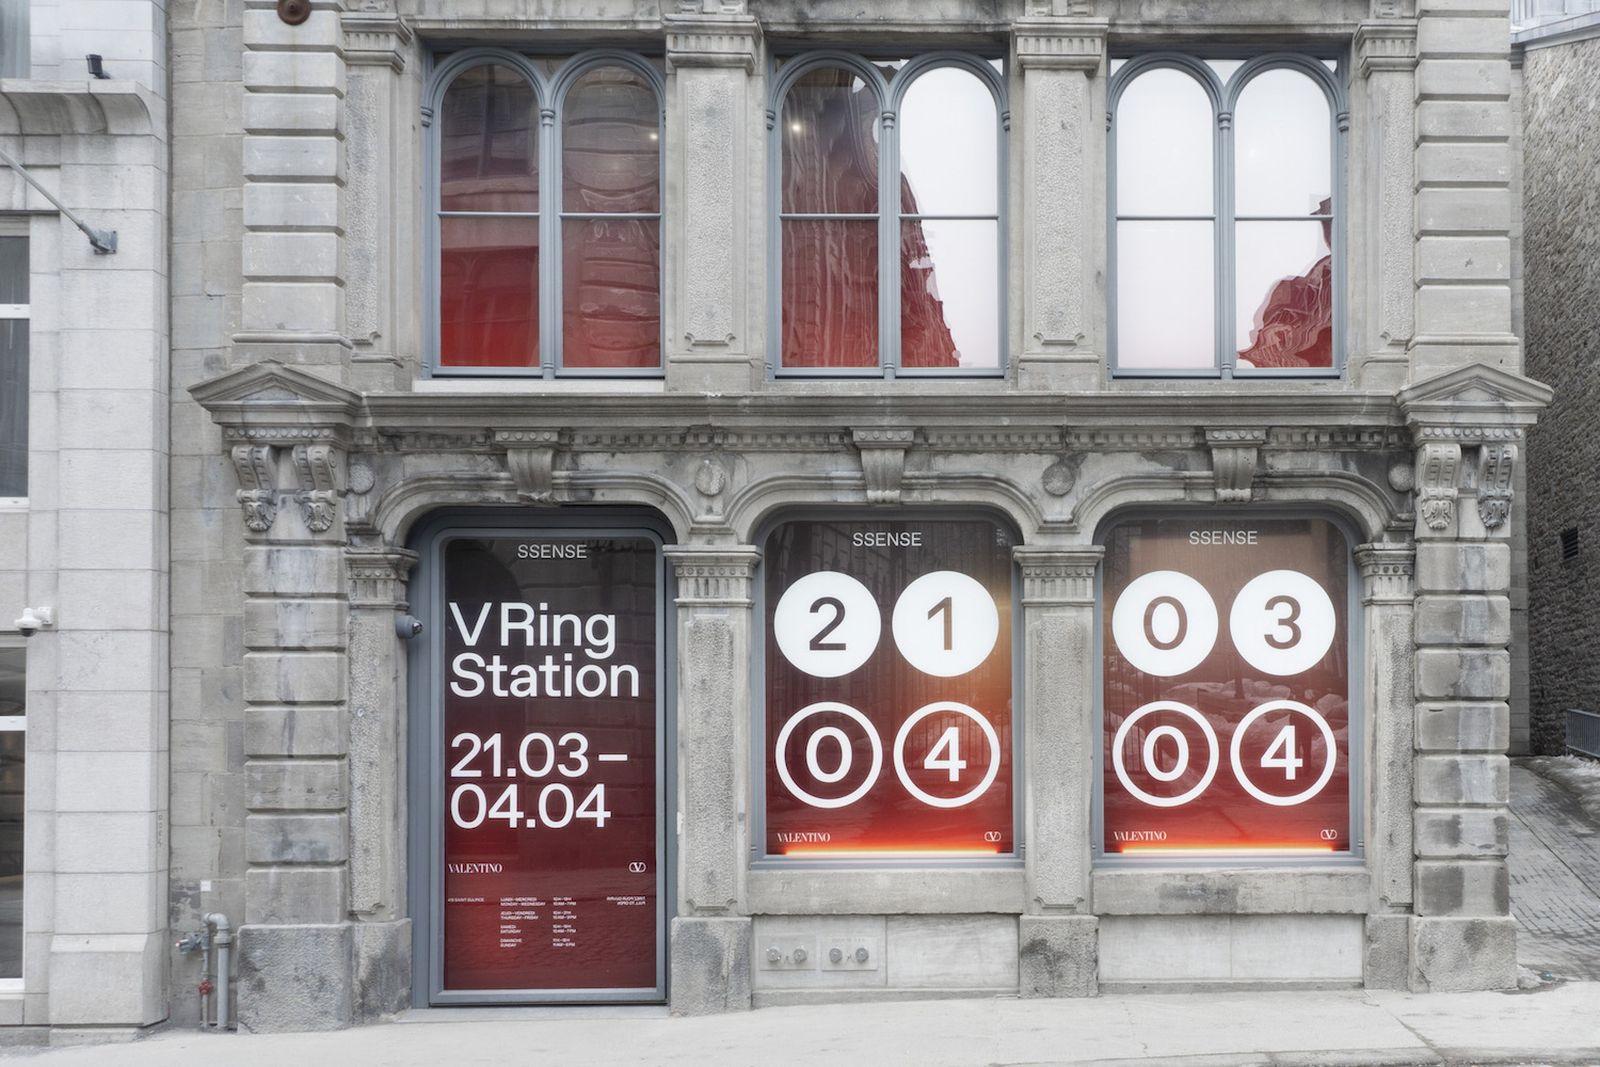 ssense valentino vring station pop up SSENSE Montreal